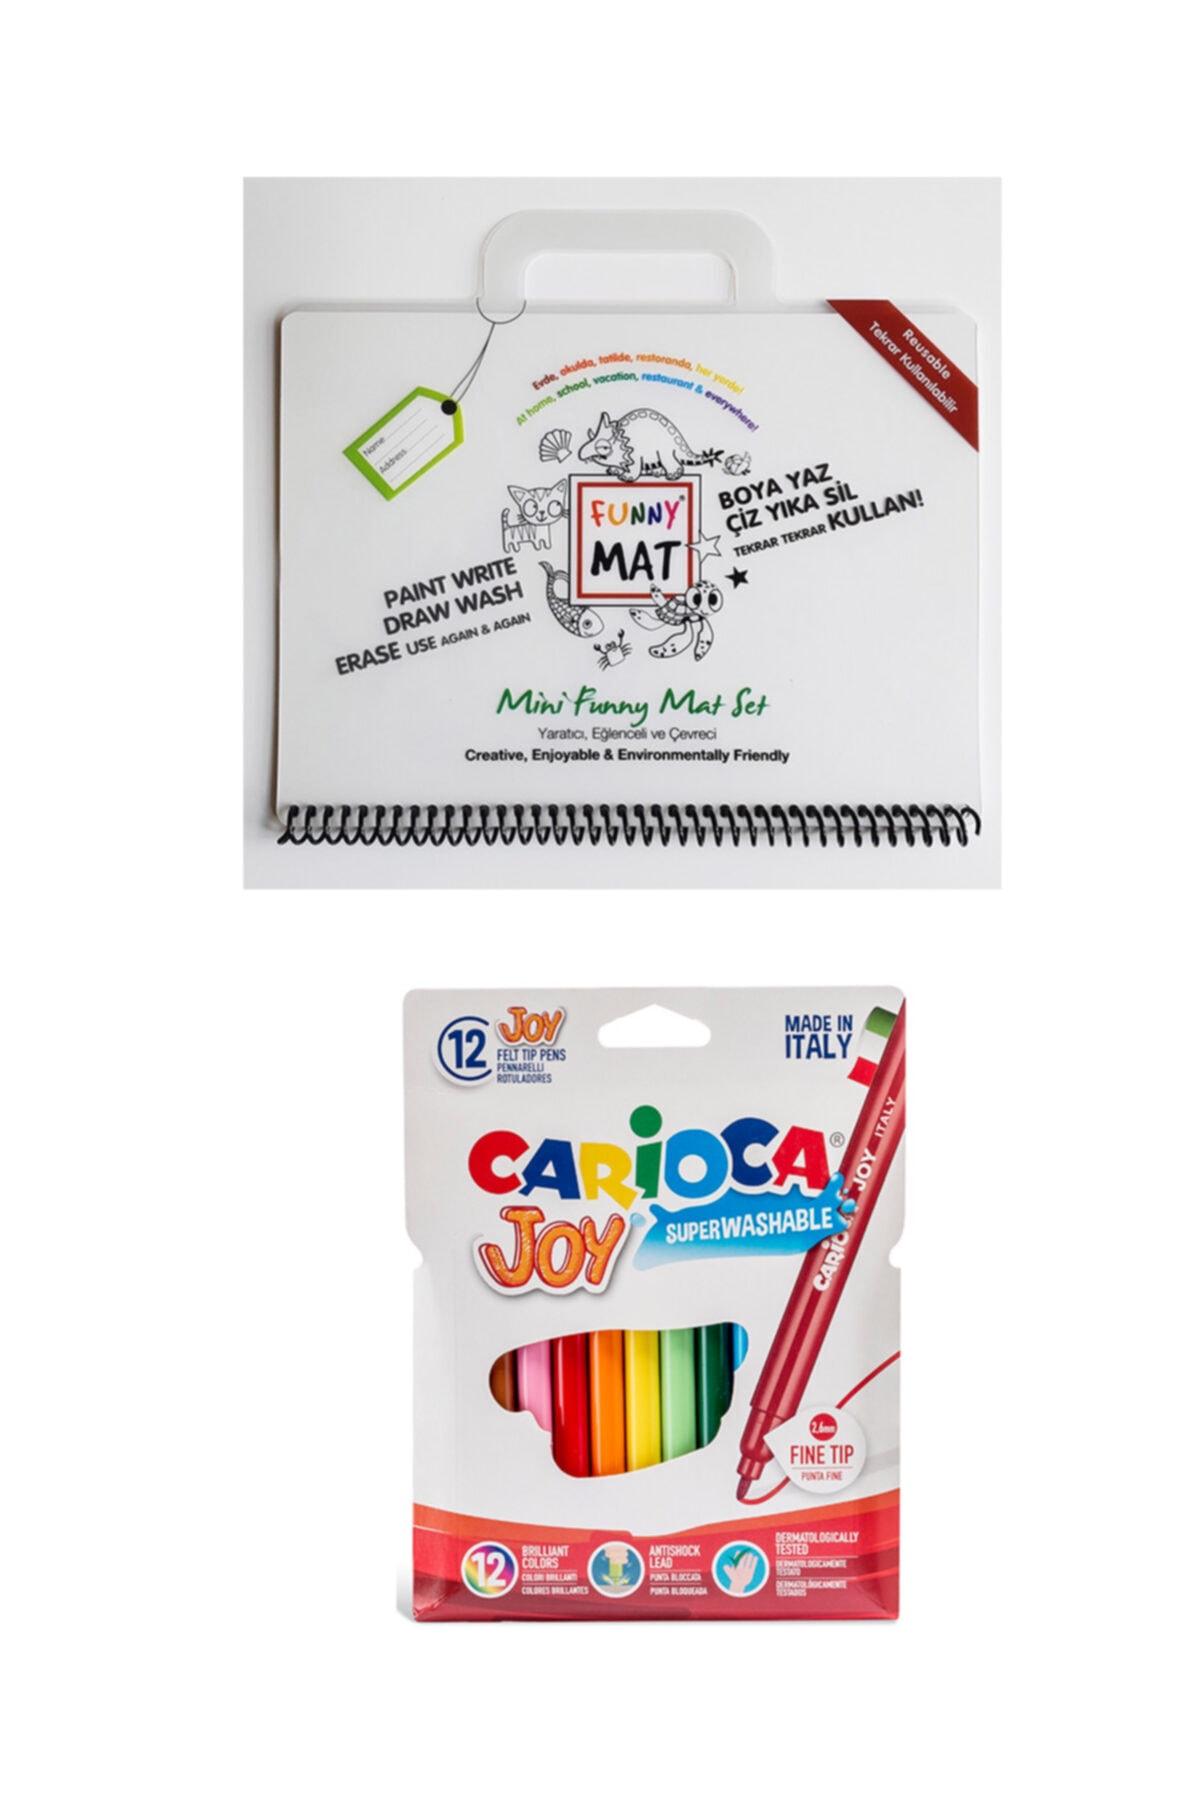 CARIOCA Toospik Akademi Çocuk Funny Mat Mini Set&carioca Joy 12'li Keçeli Kalem Seti 1